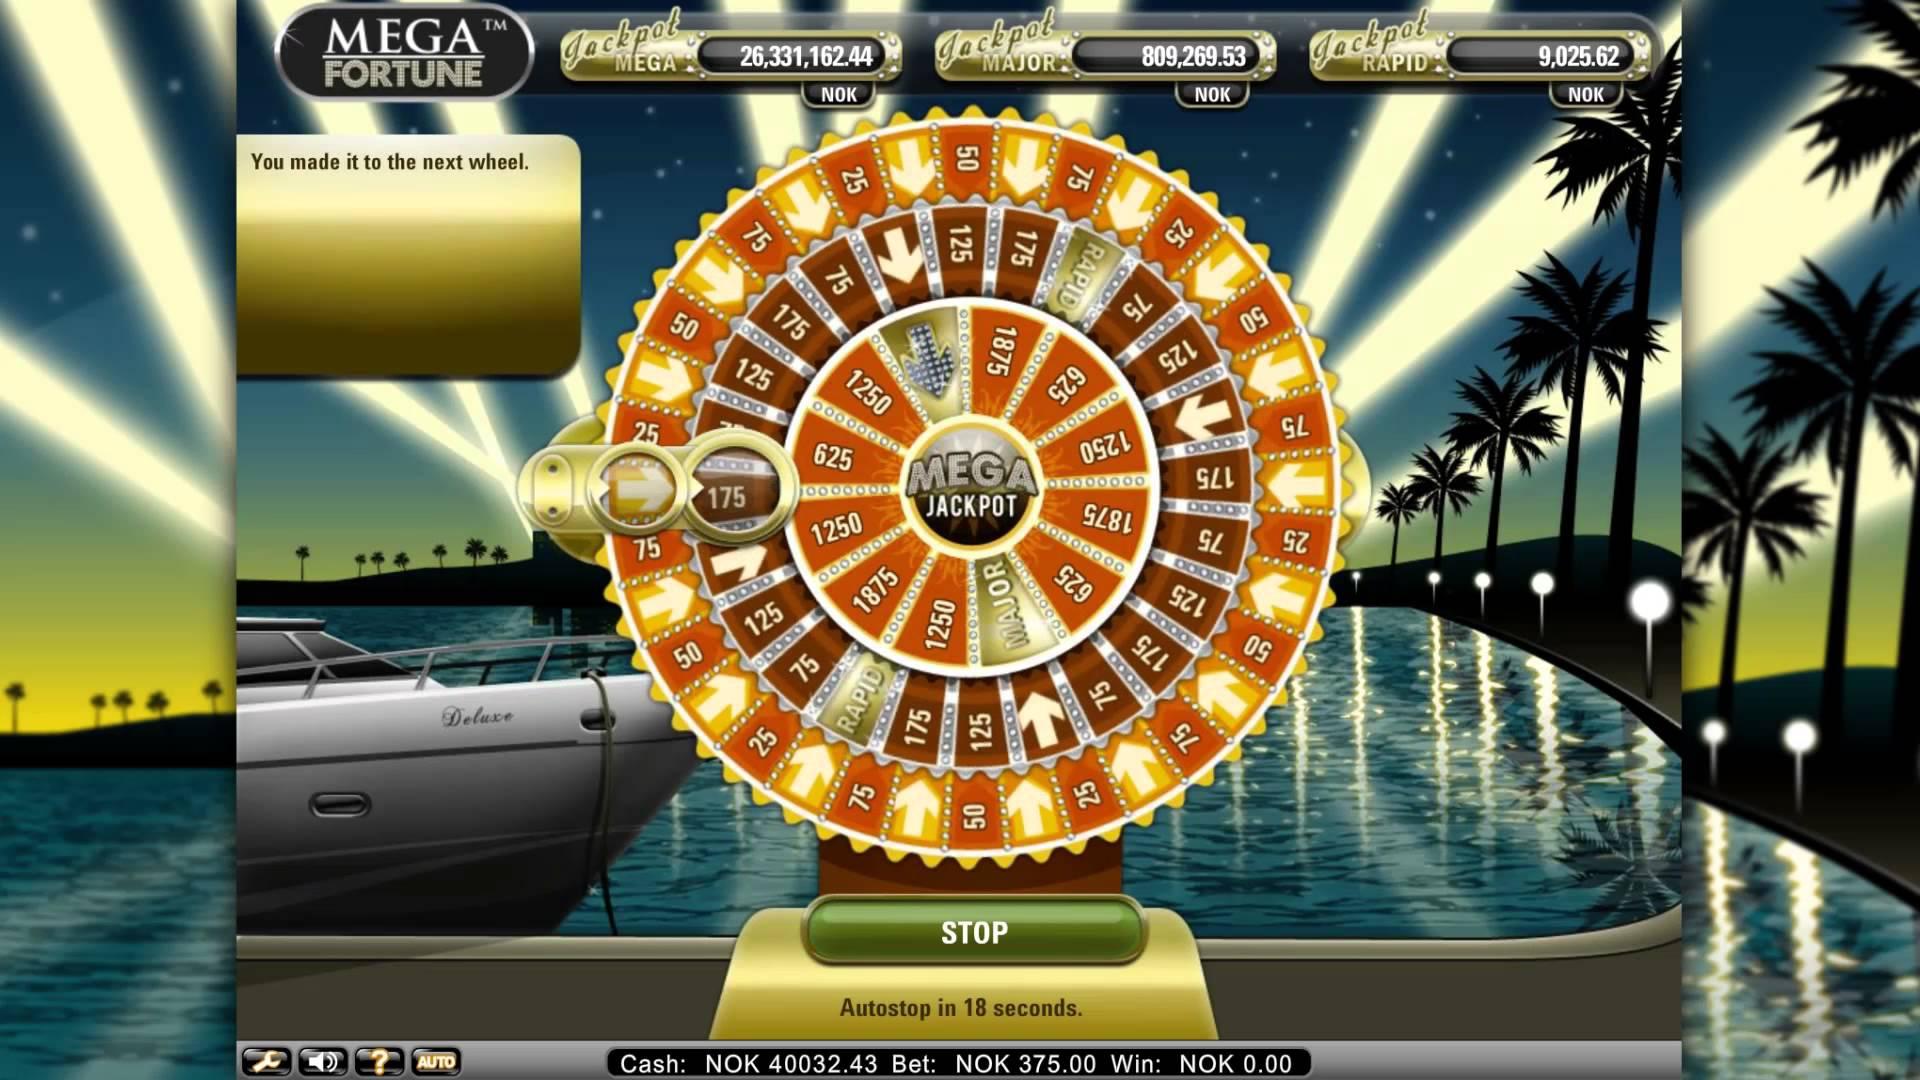 Bonusrunde beim Mega Fortune Slot von NetEnt